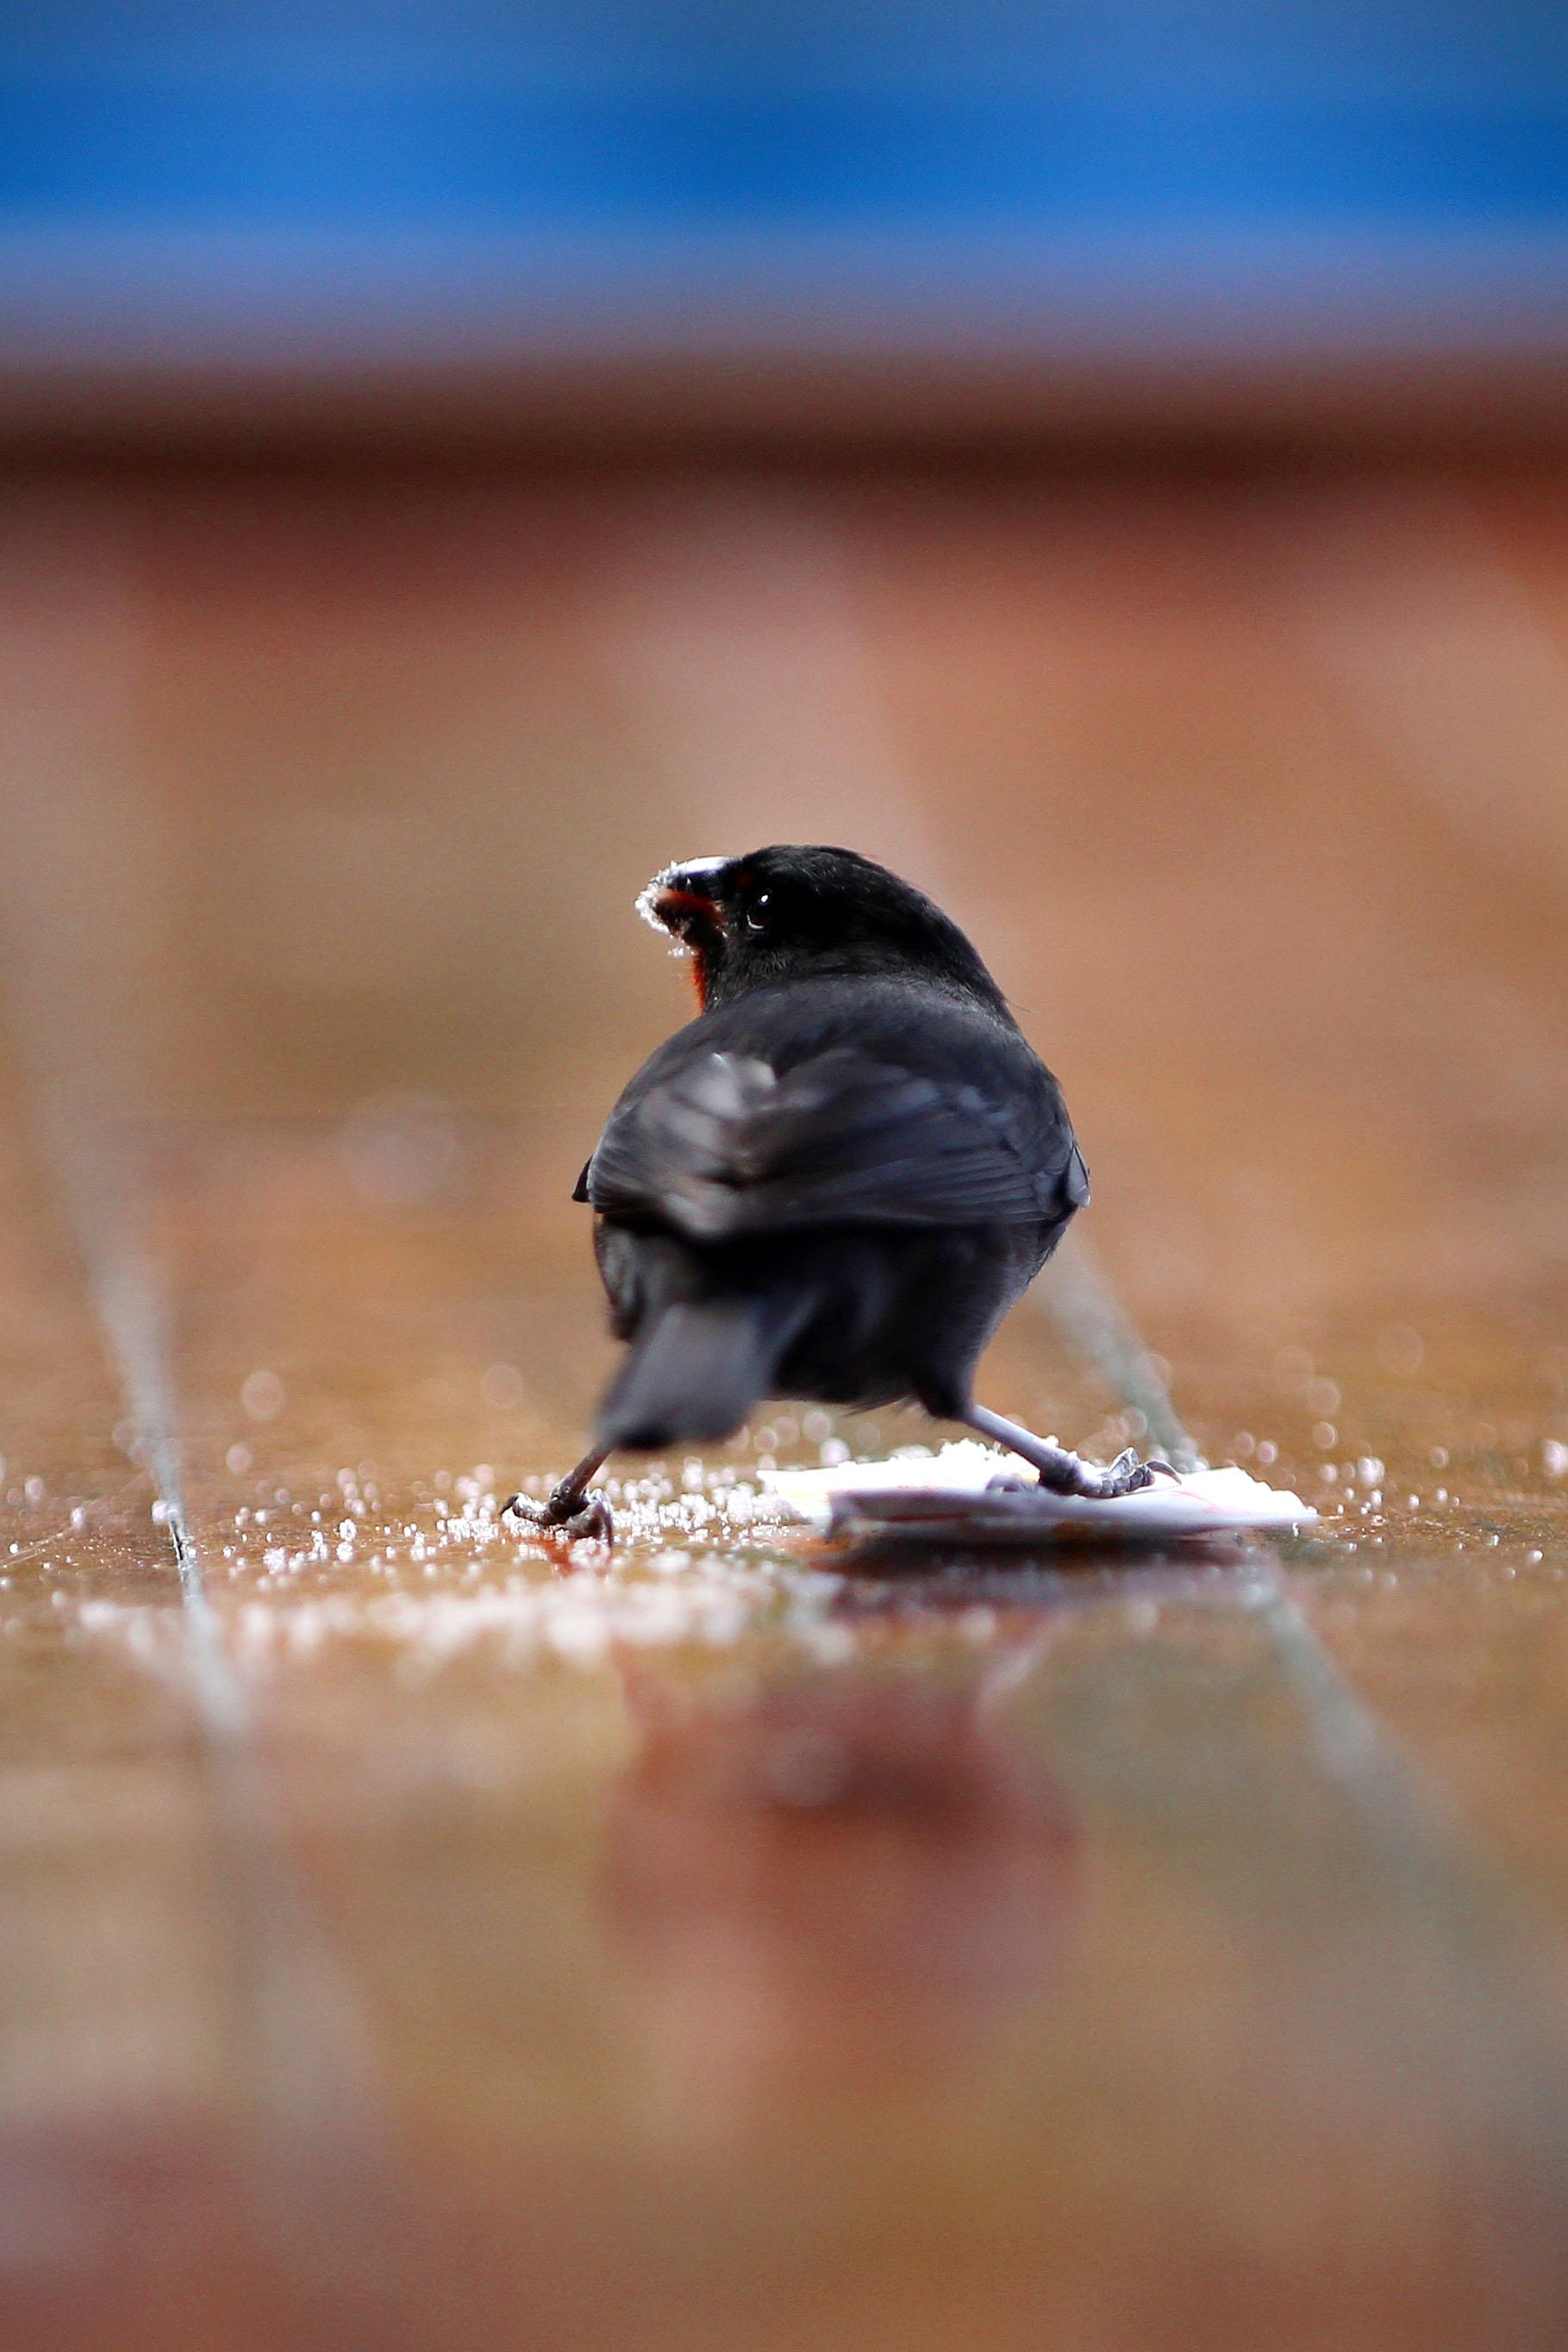 2015-12-18_St_Lucia_Ladera_Birds_Pu.Ying.Huang 0088.jpg